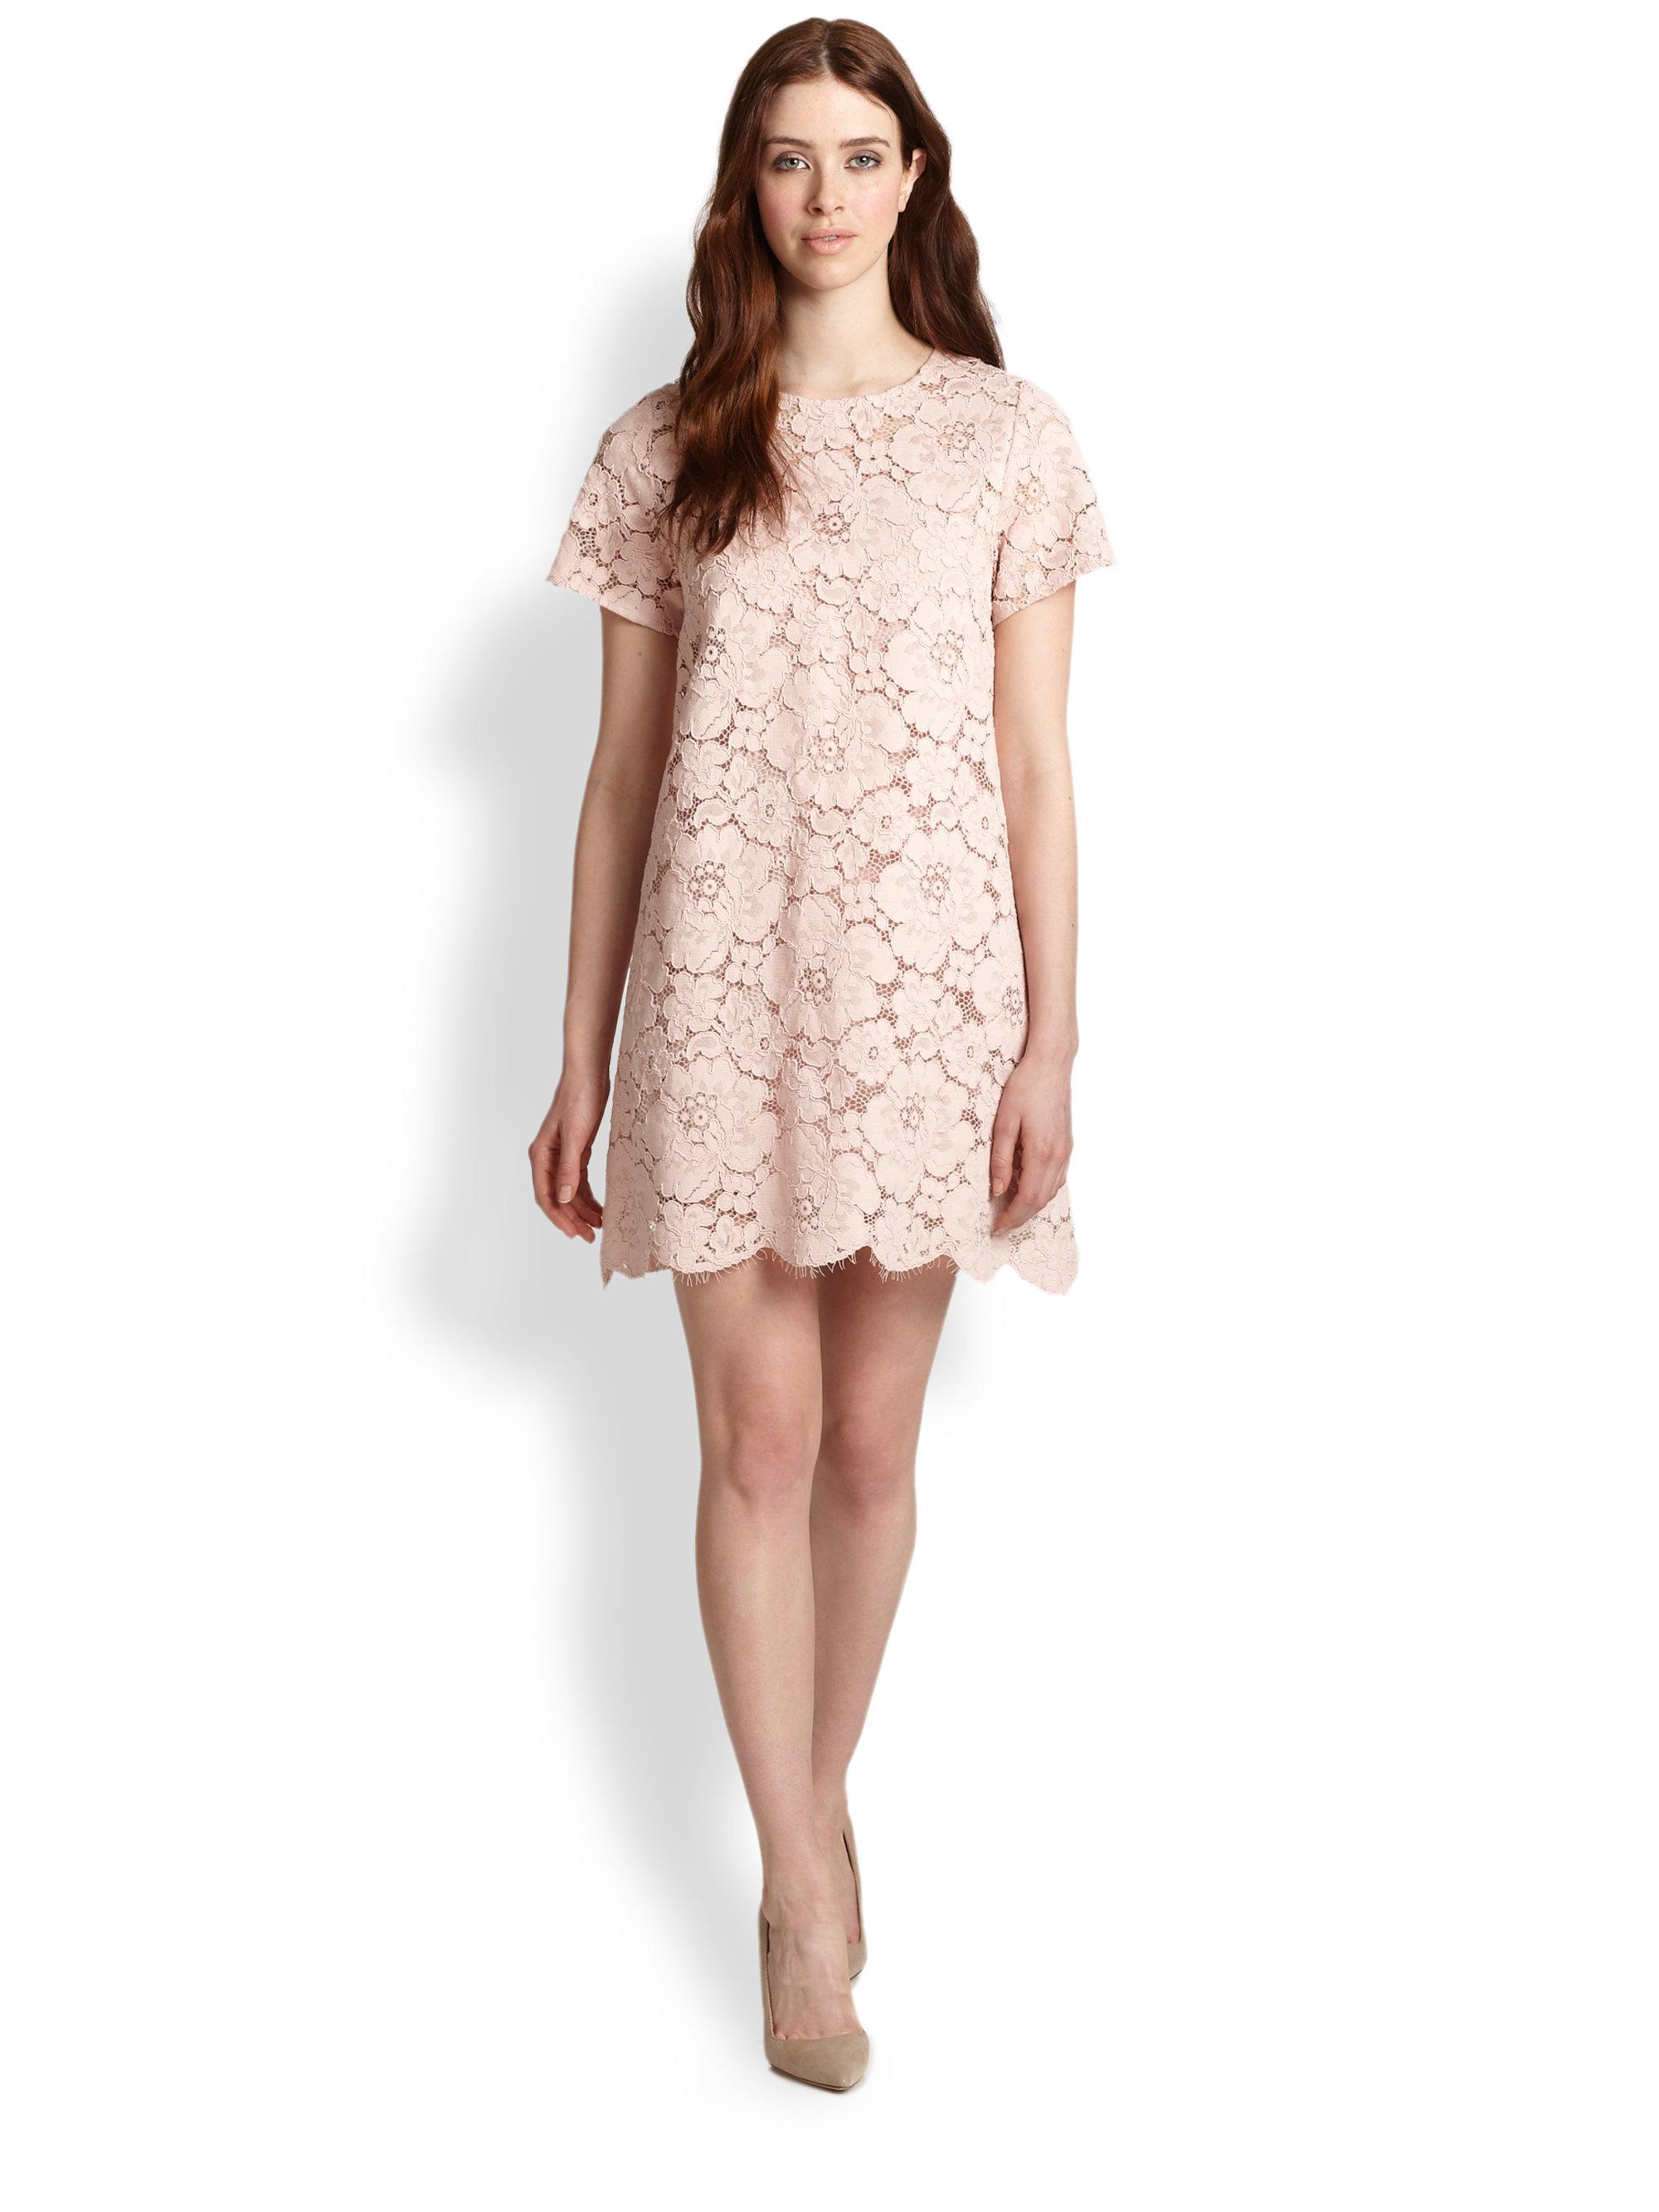 Lyst bcbgmaxazria floral lace dress in pink gallery mightylinksfo